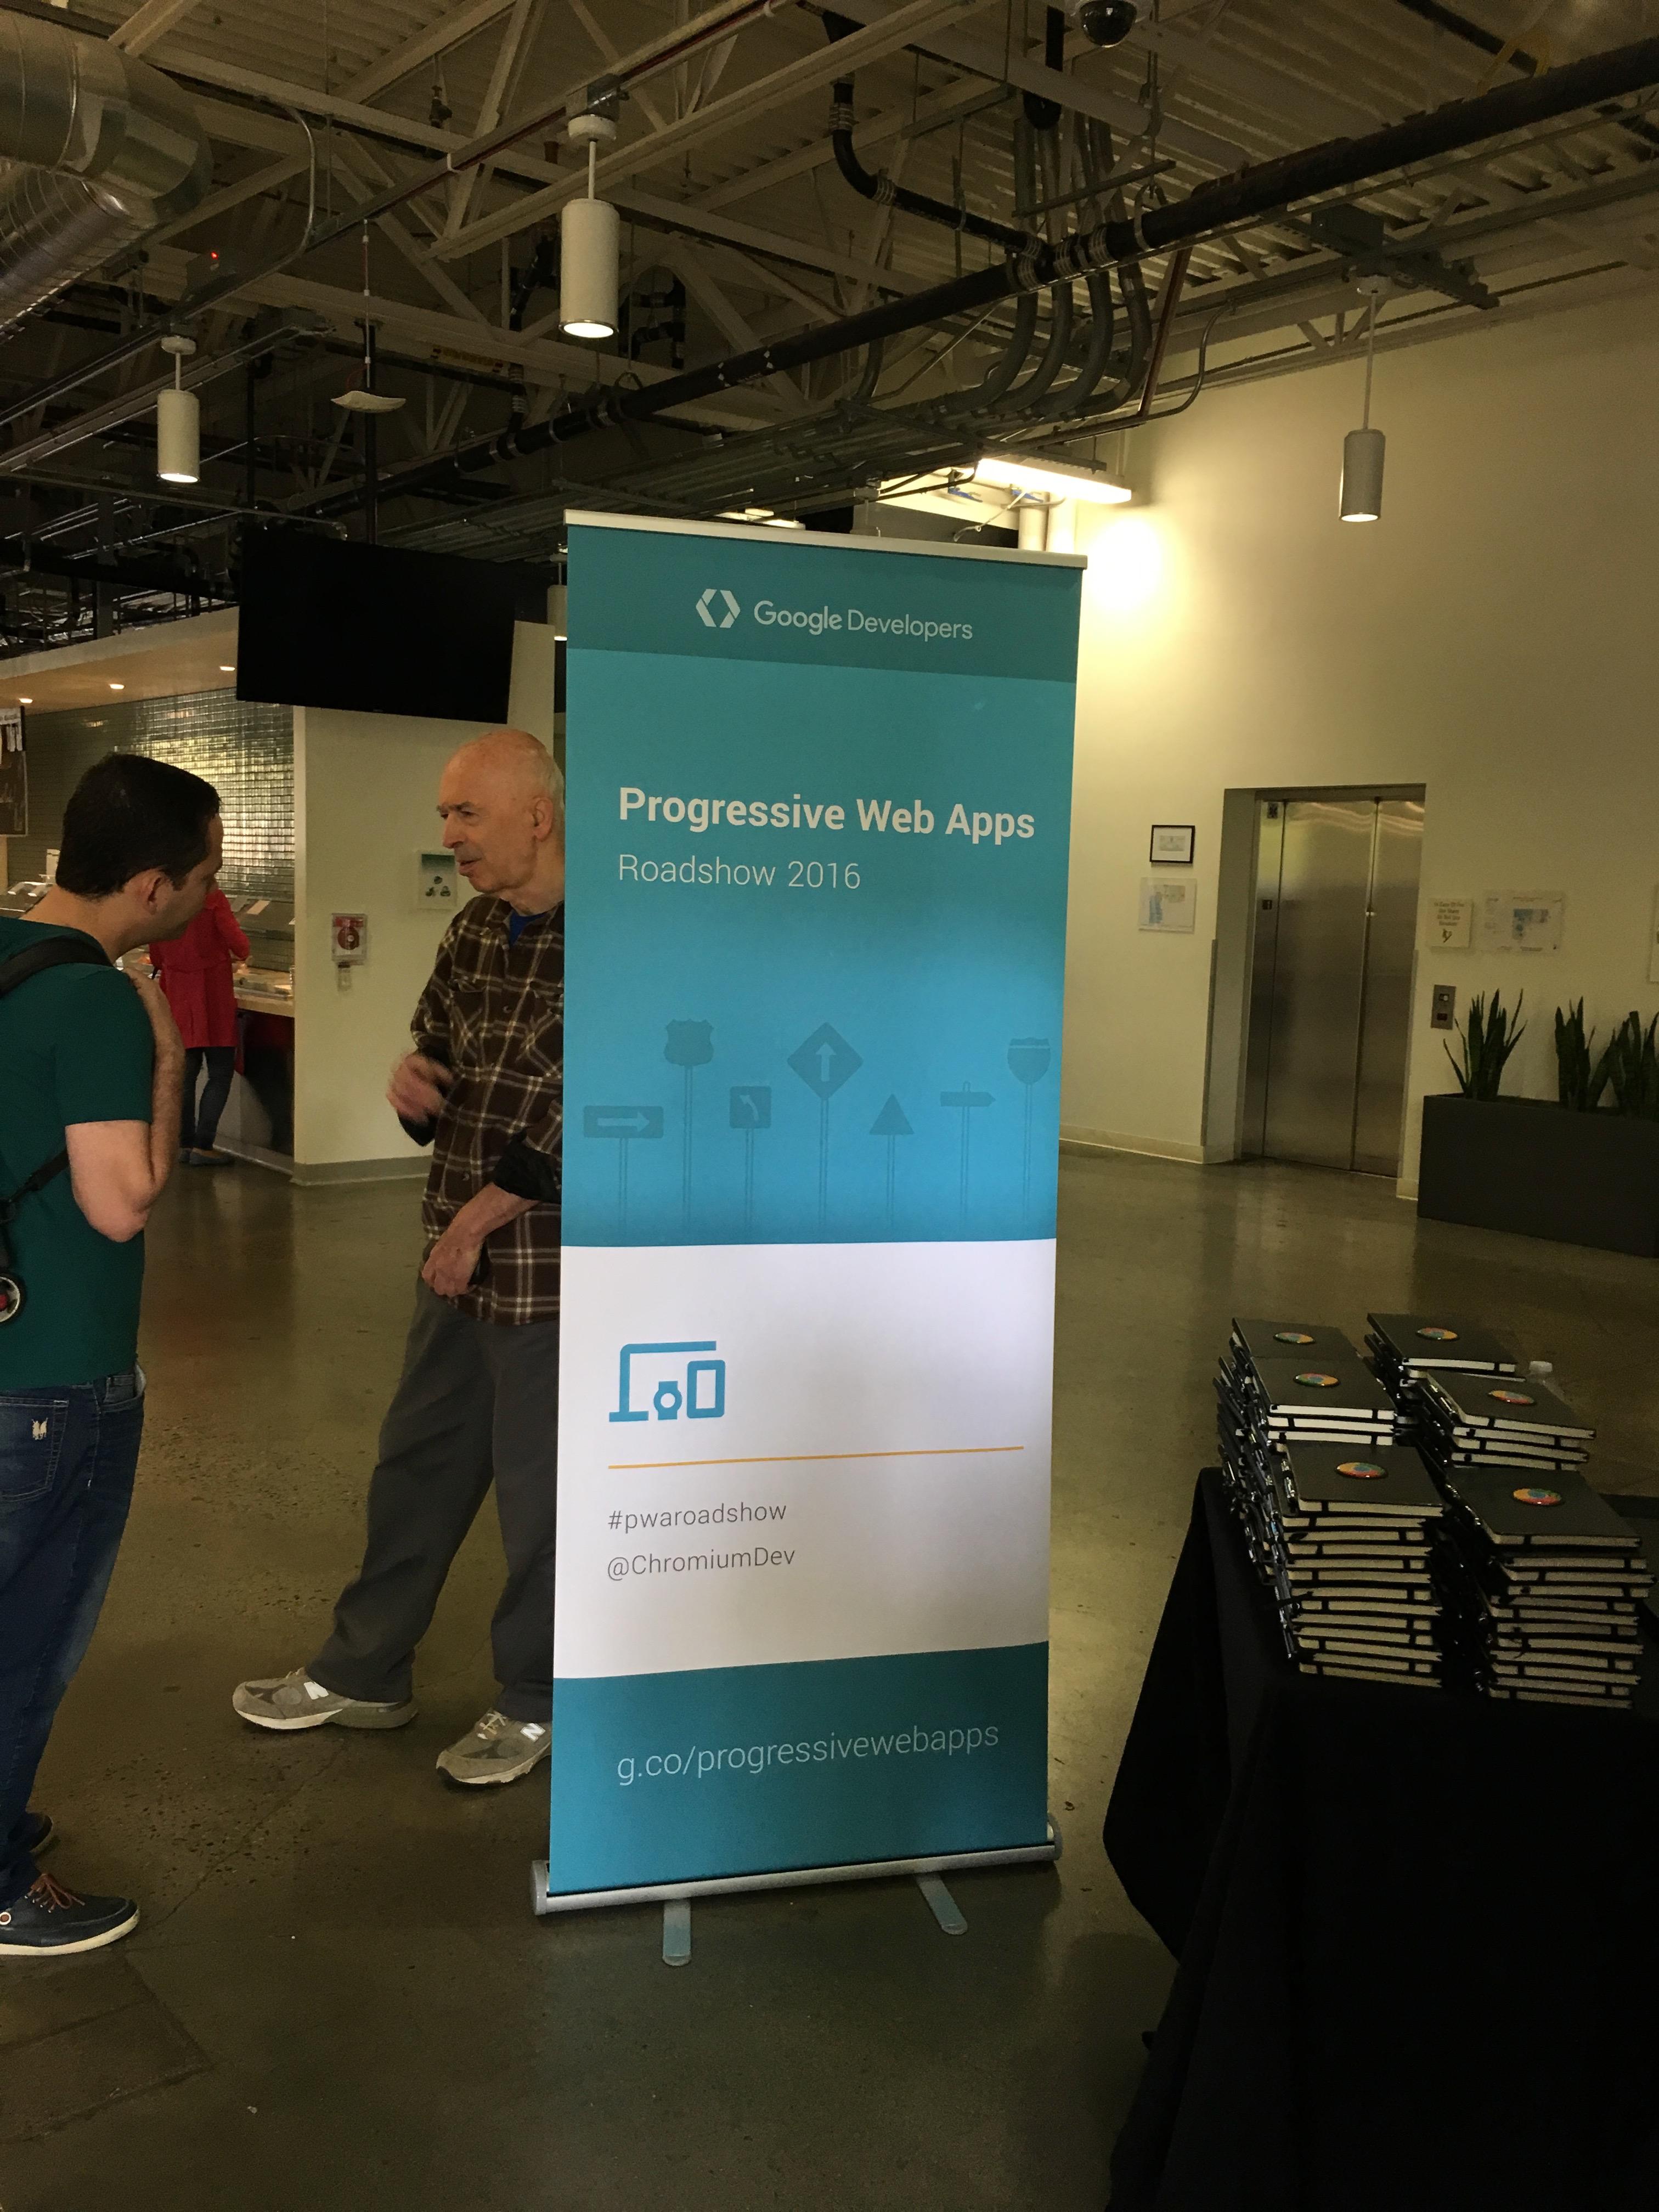 Progressive Web Apps Roadshow